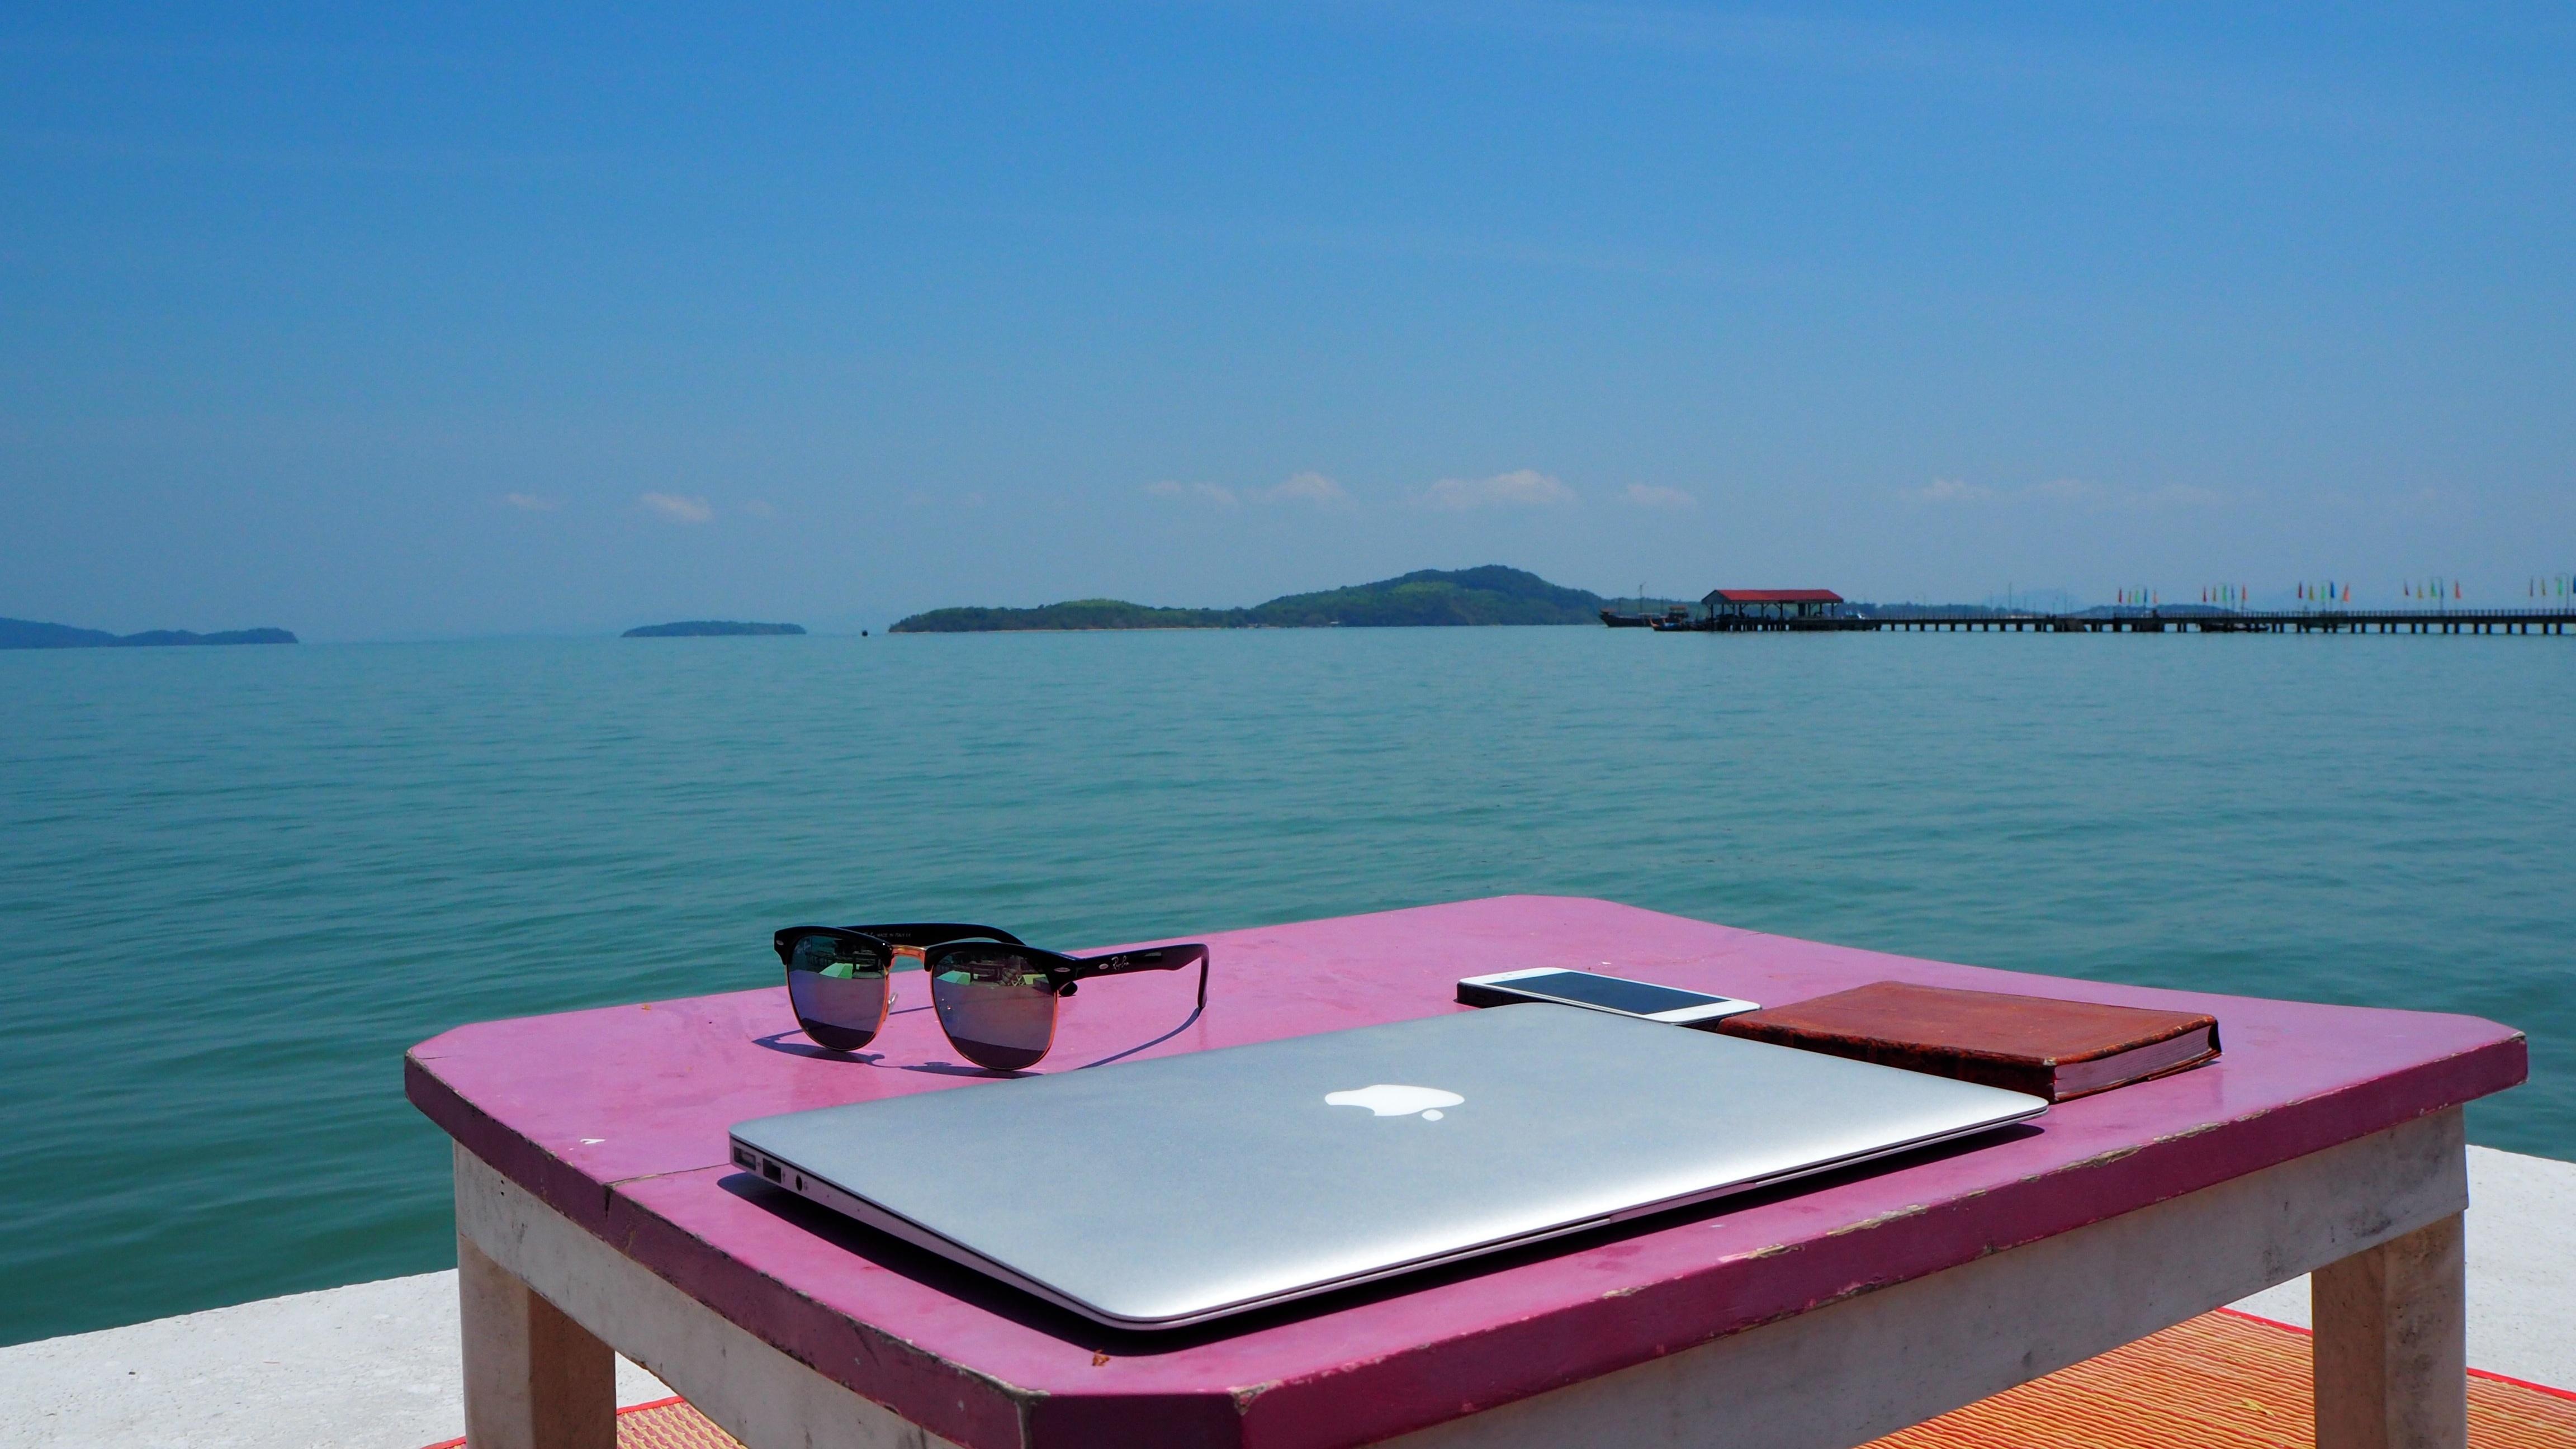 Kostenlose foto : Meer, Boot, Ferien, Fahrzeug, Paradies, Pool ...